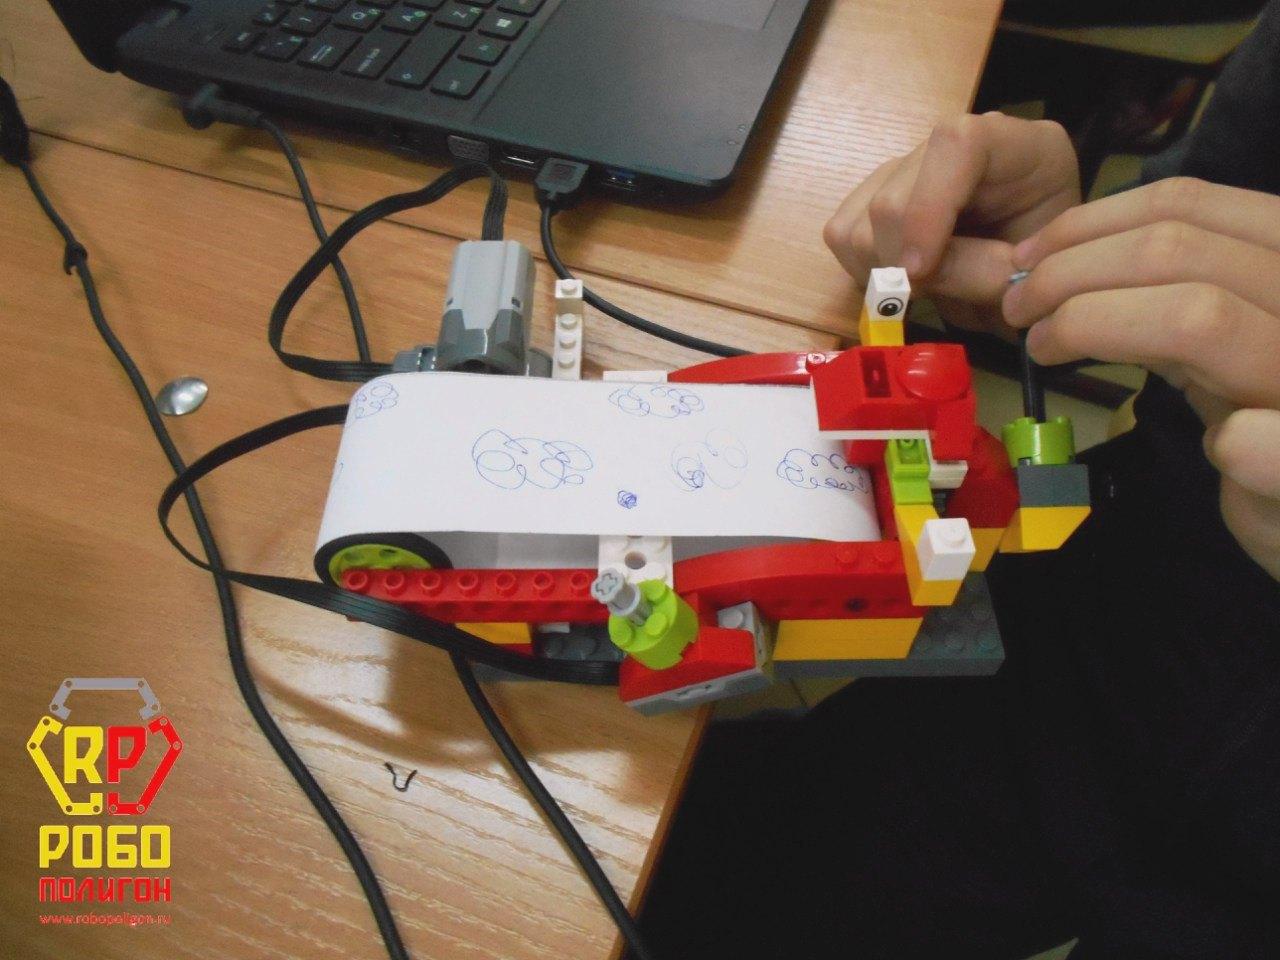 robopoligon_PervoRobot-2_8